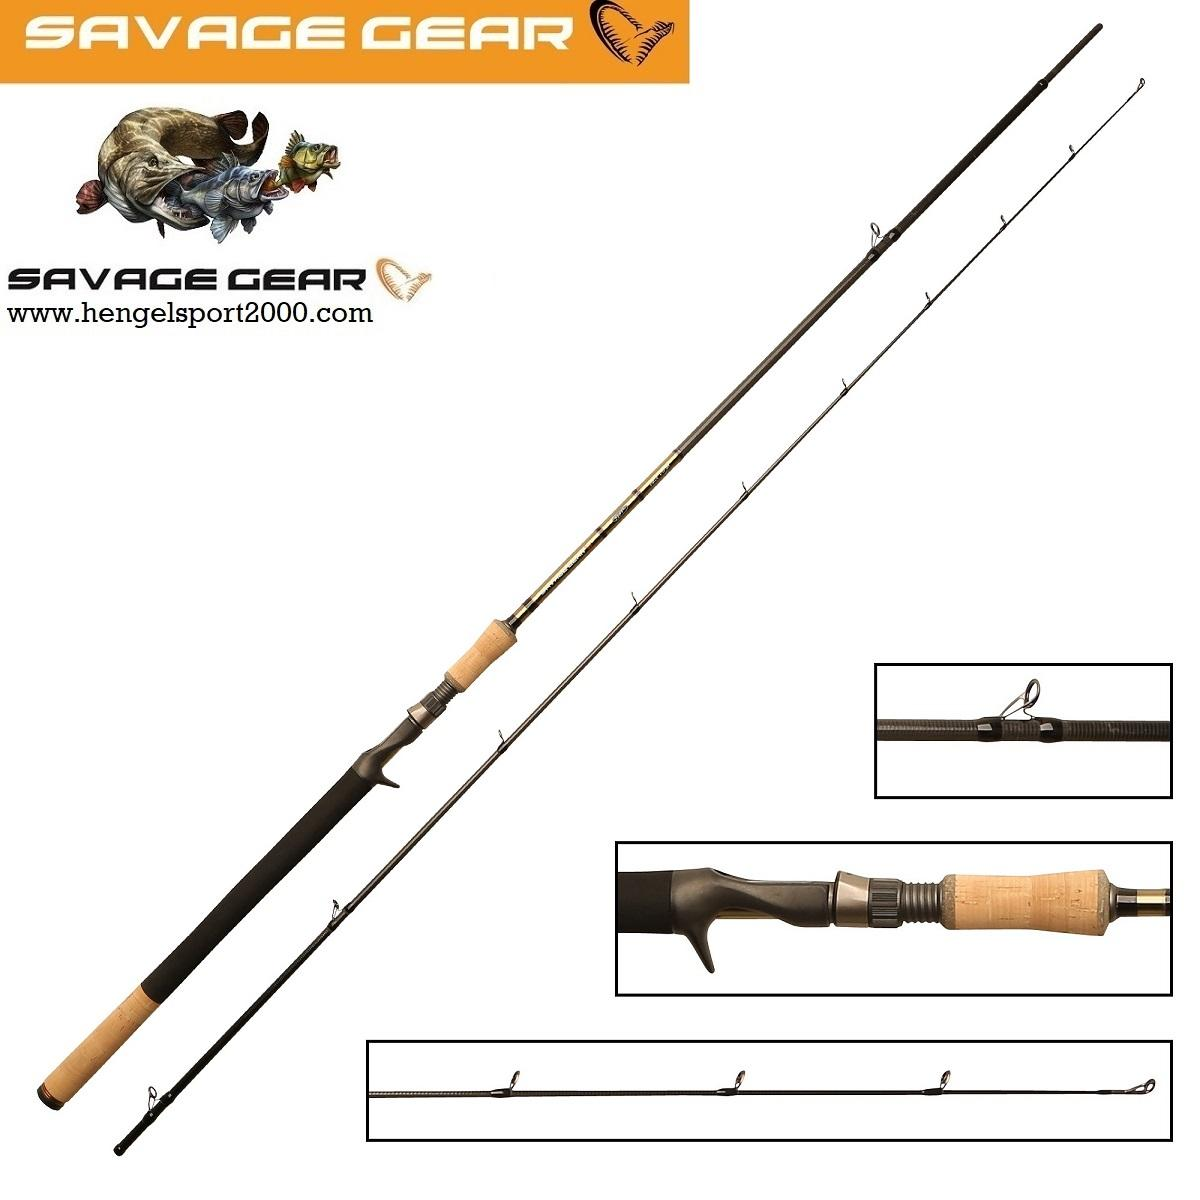 Savage Gear Butch Light XLNT2 274 cm 60 - 150 gram